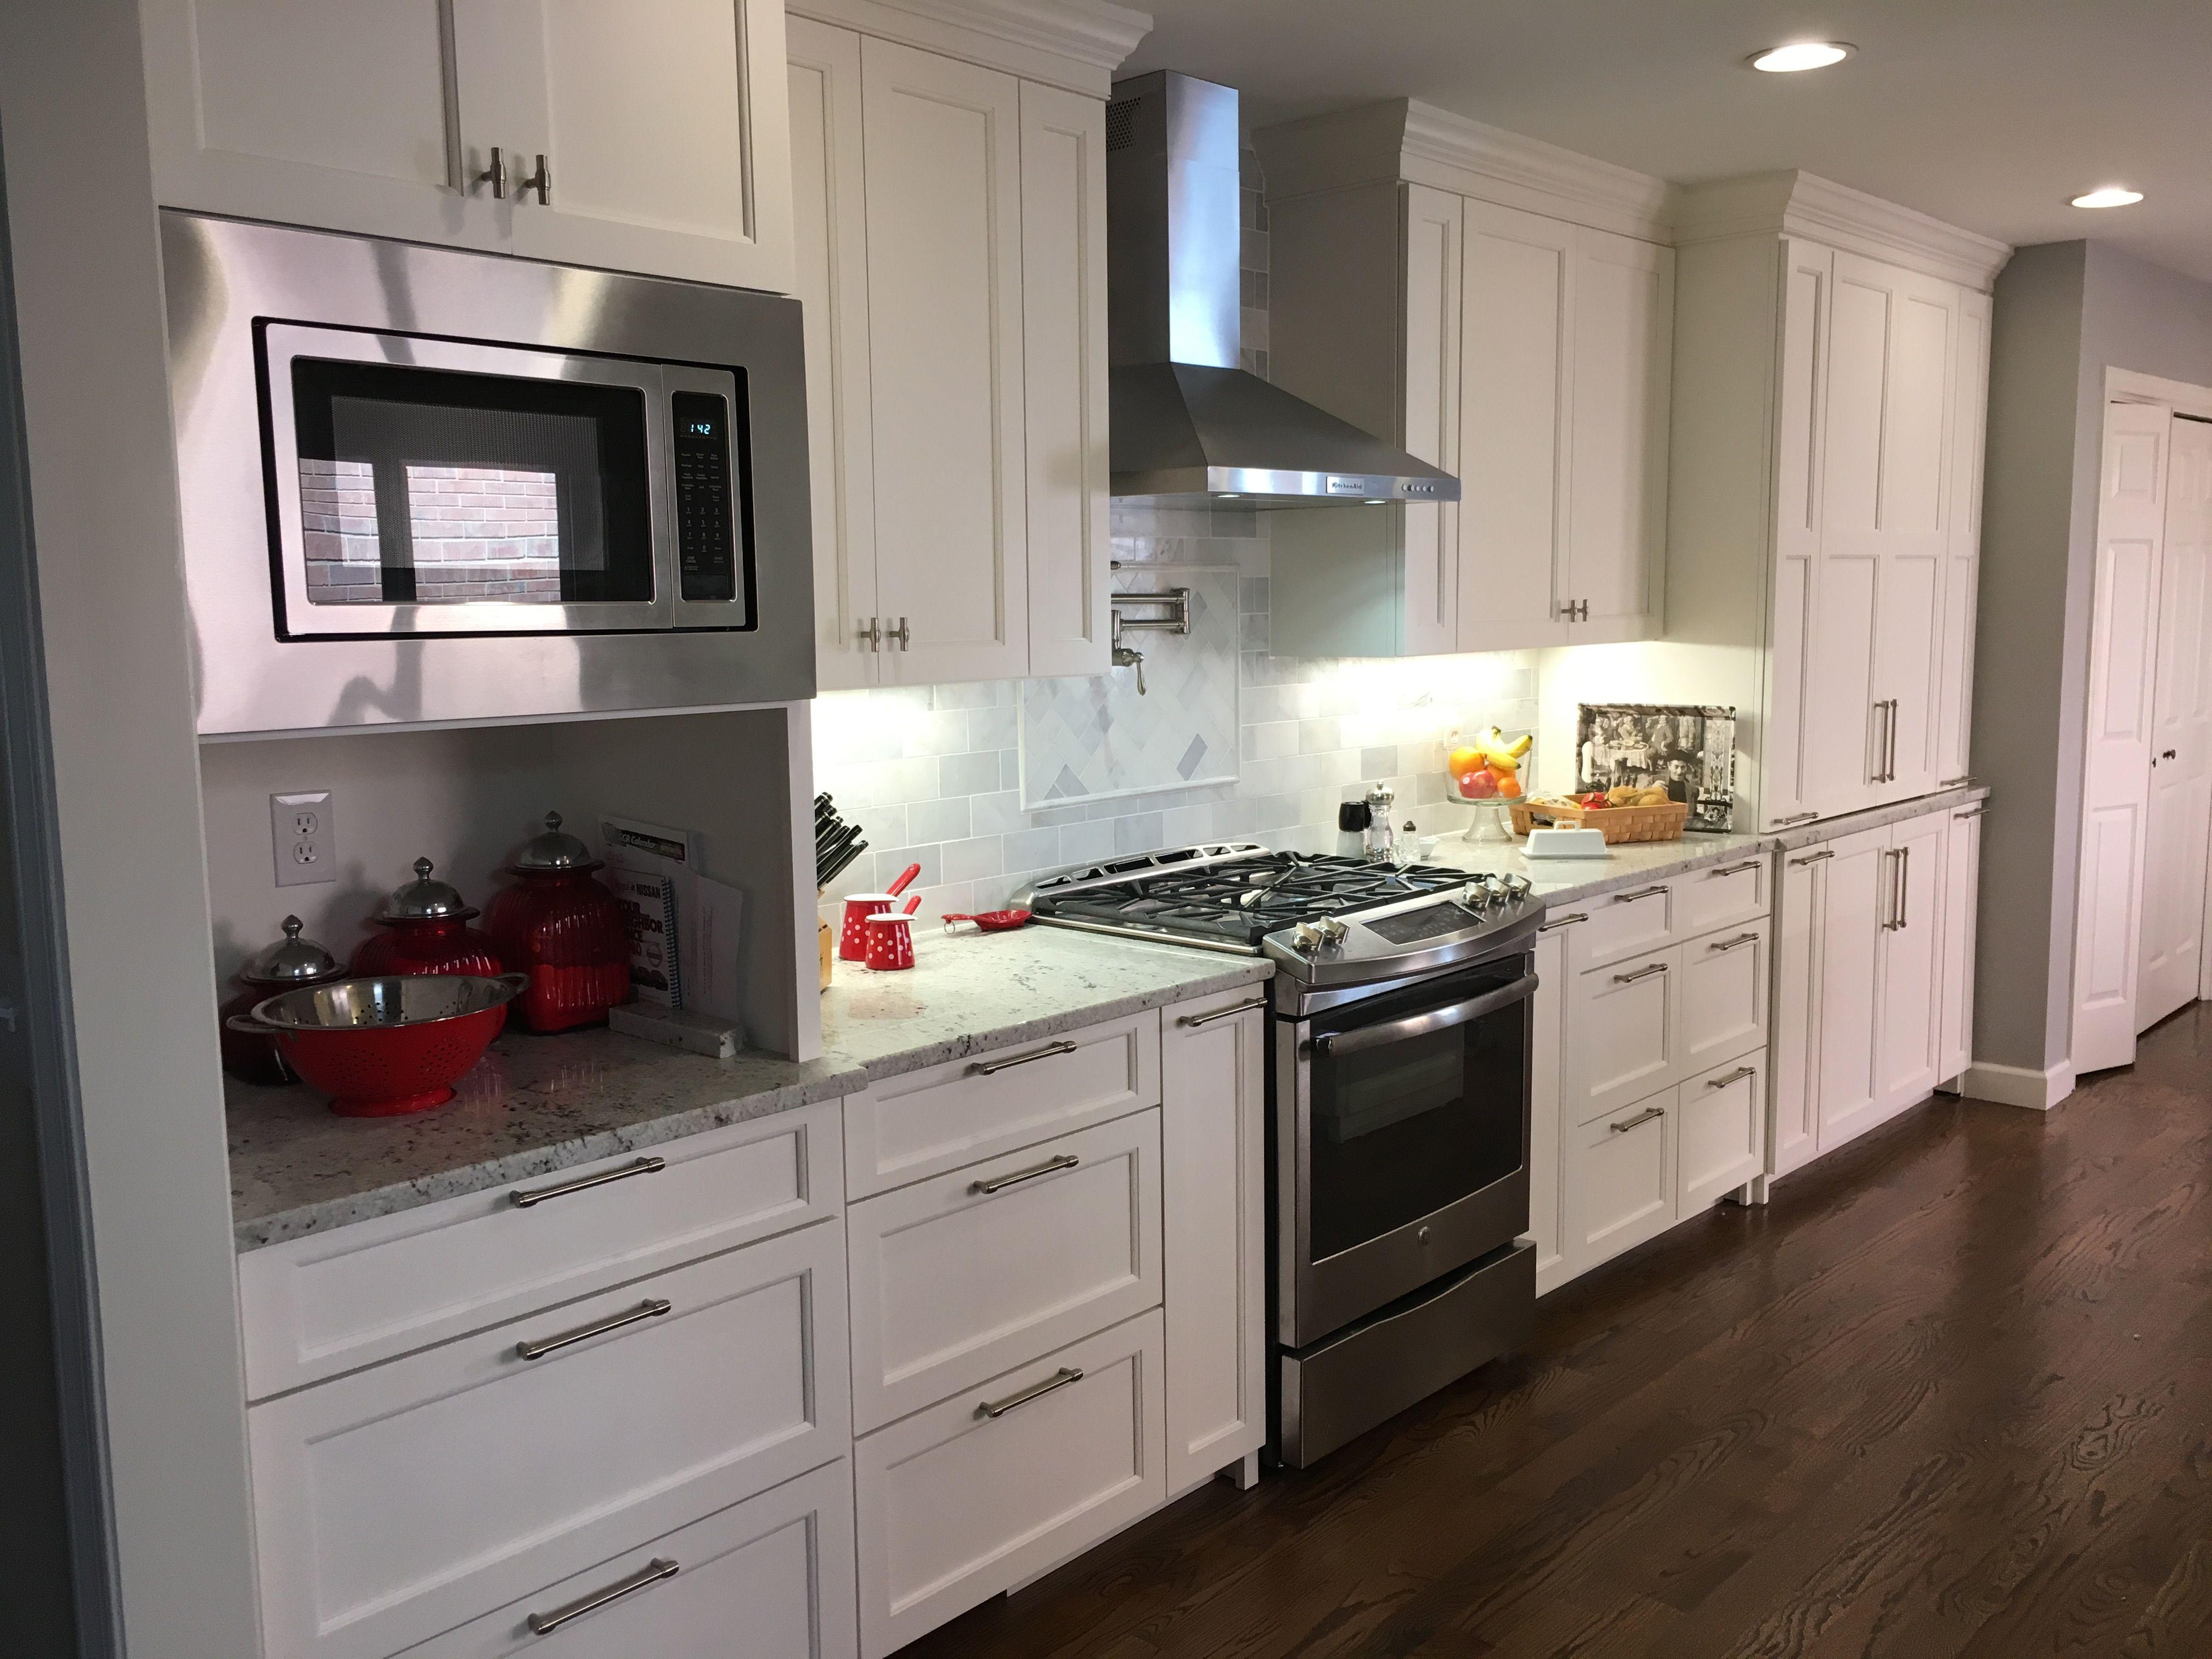 Kitchen in Sherwin Williams Greek Villa. Overlay fronts ...